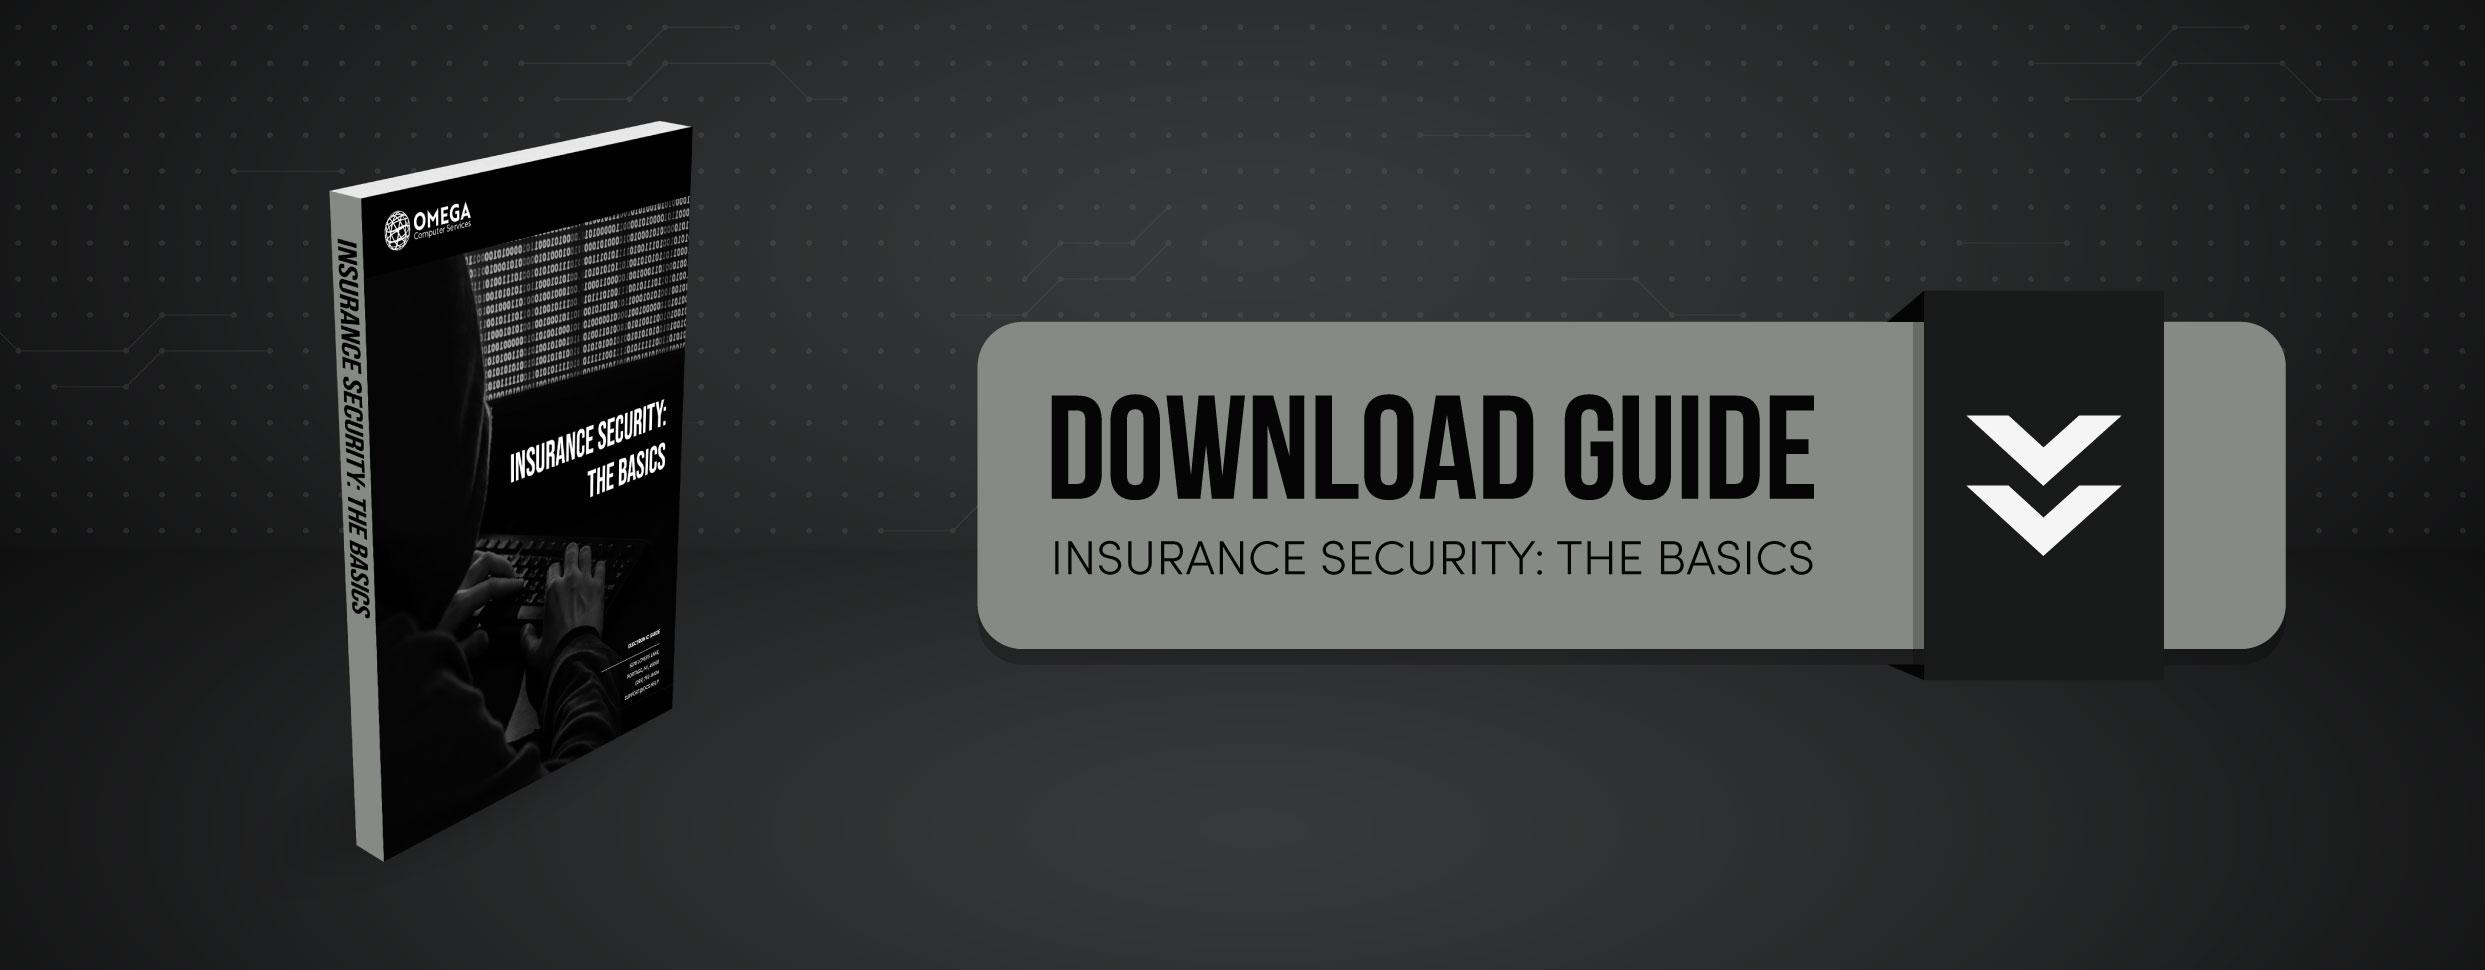 blockchain, bitcoin, insurance security guide